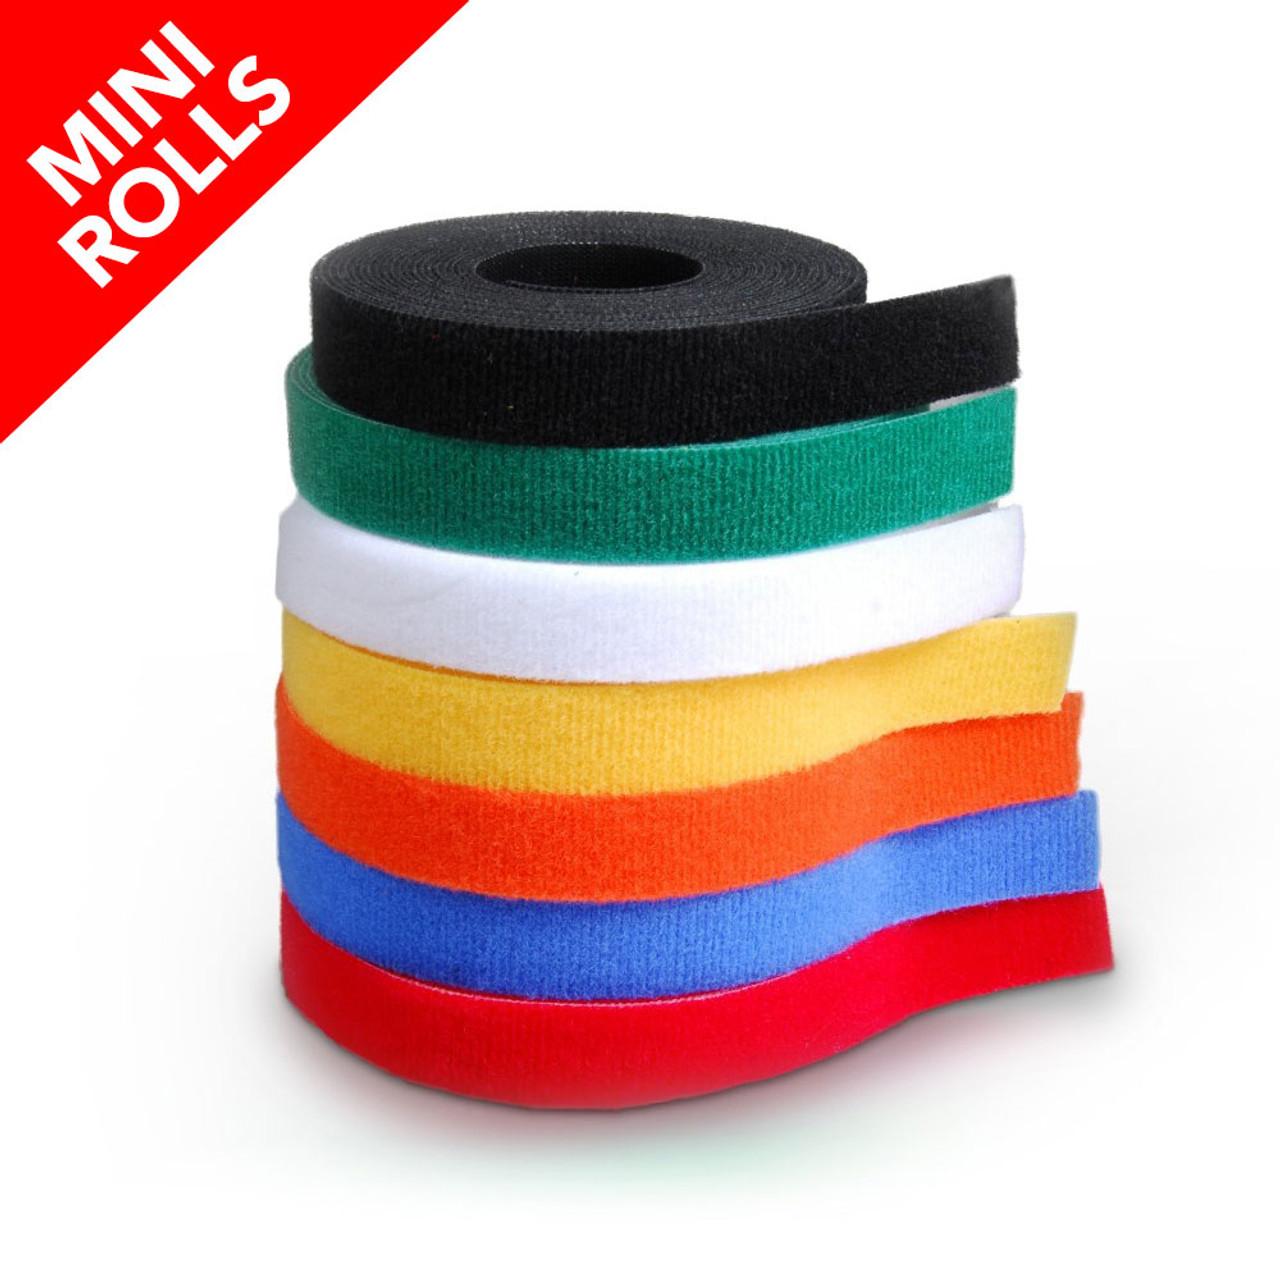 VELCRO® Brand ONE-WRAP® Tape Mini Rolls